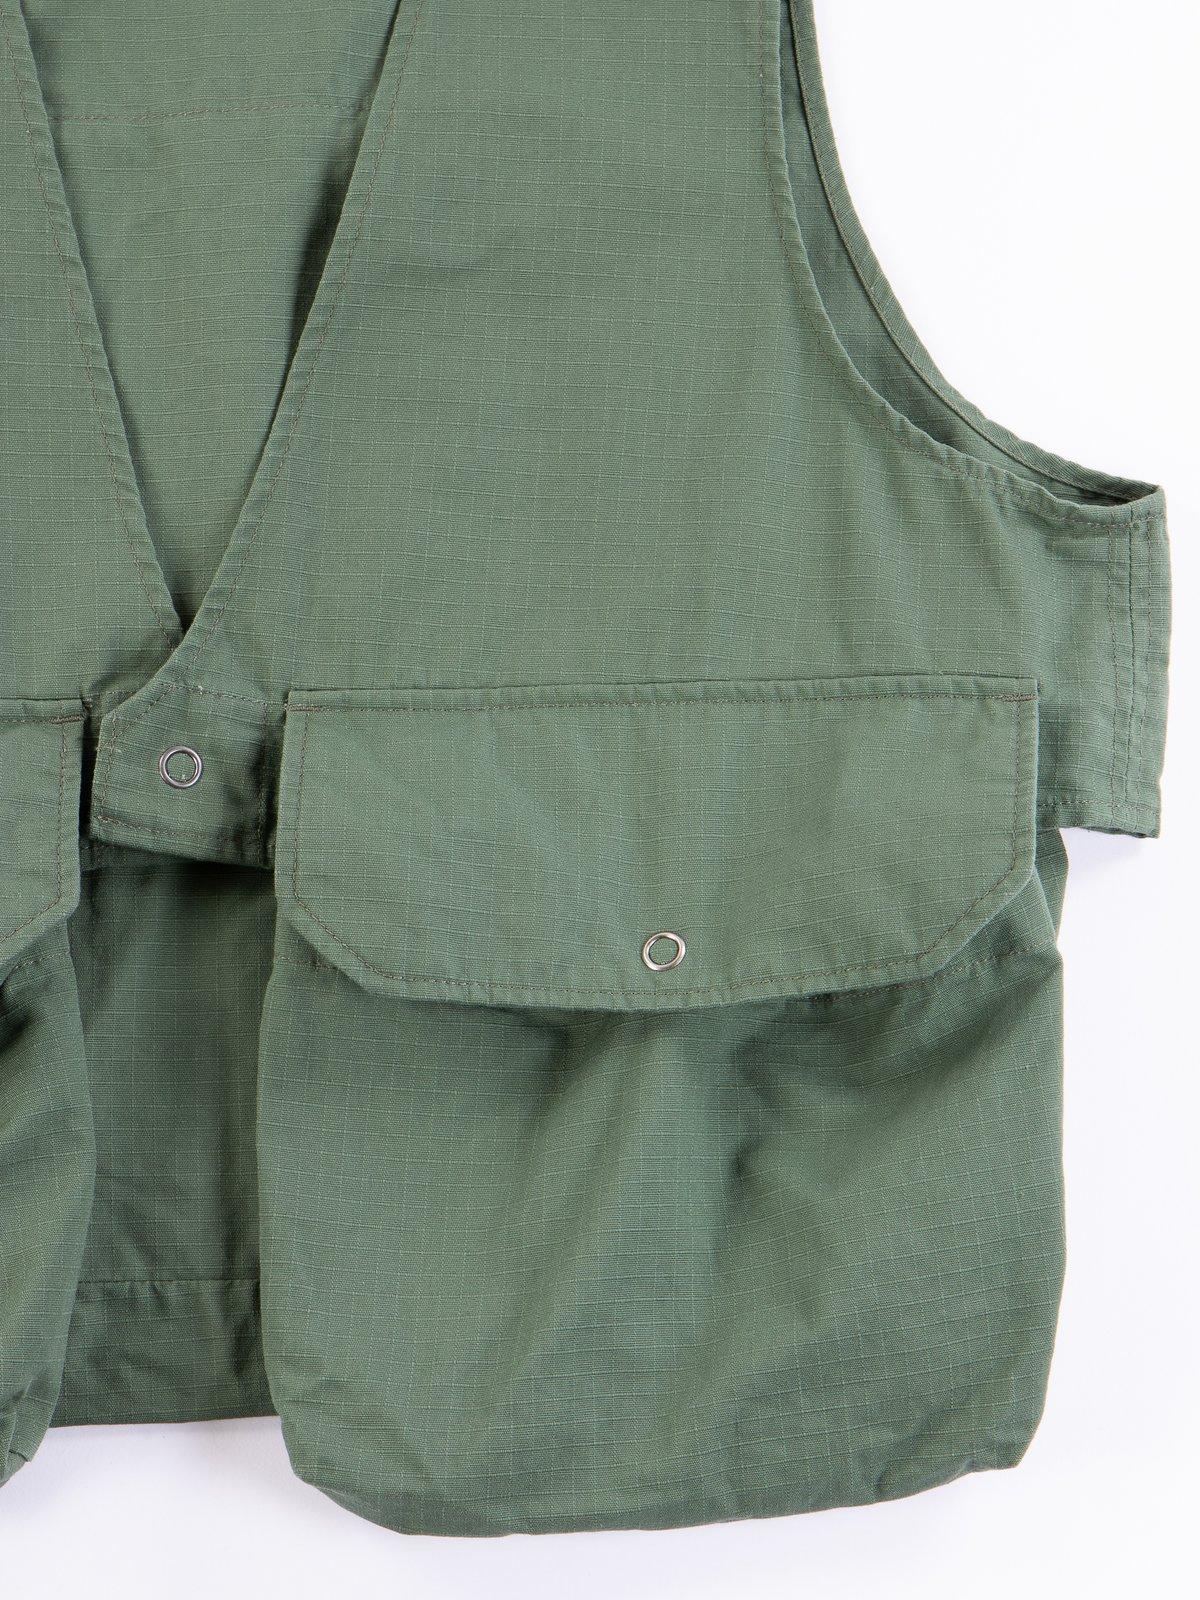 Olive Cotton Ripstop Fowl Vest - Image 4